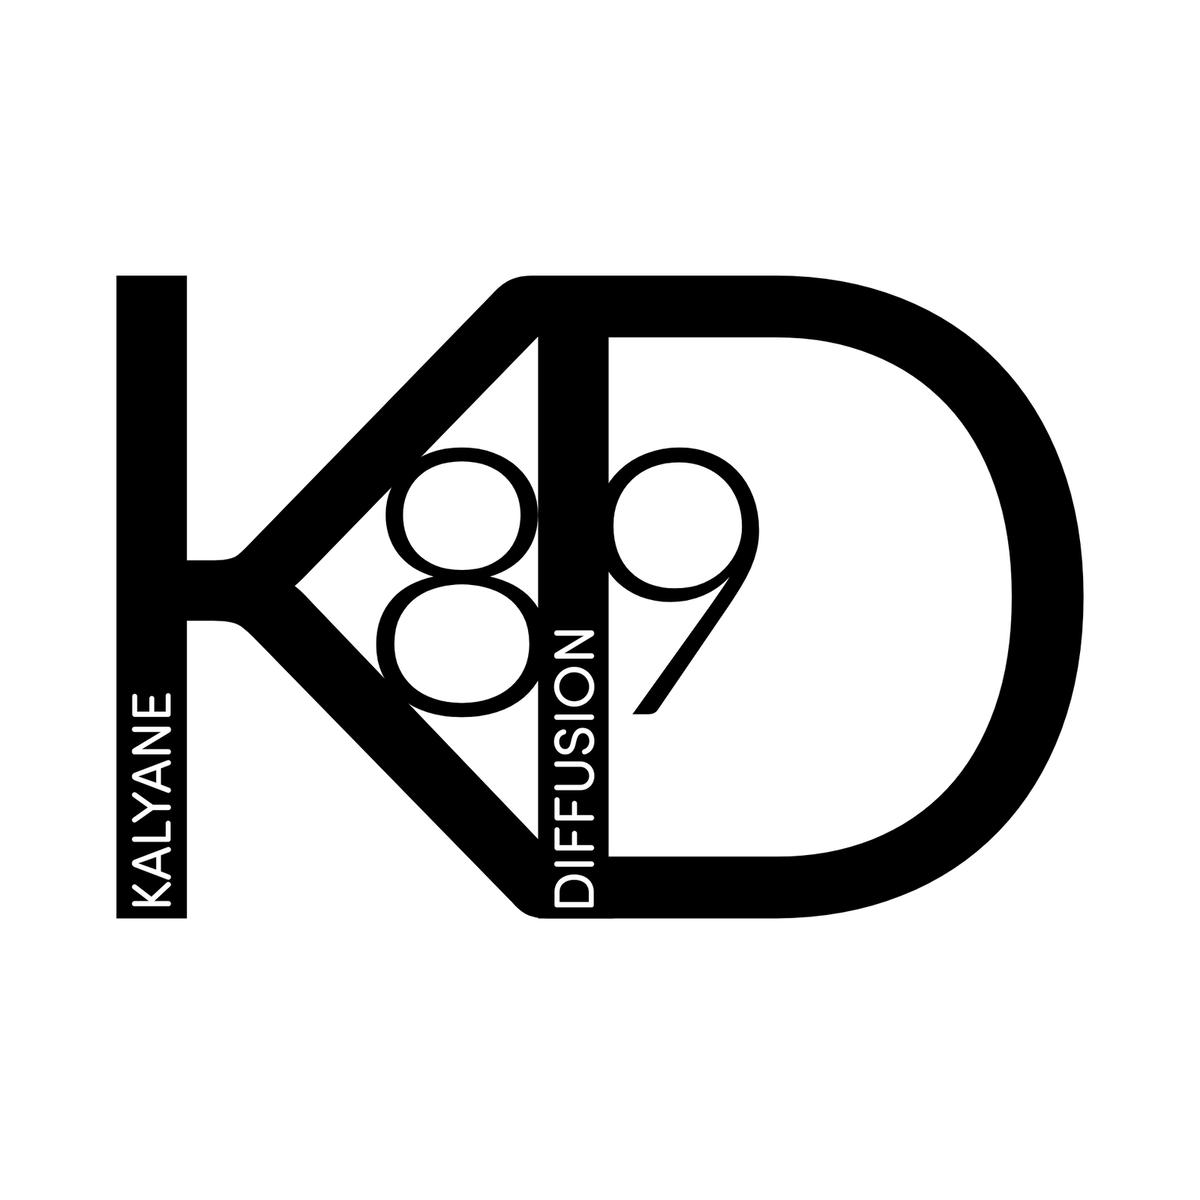 KD89 FR